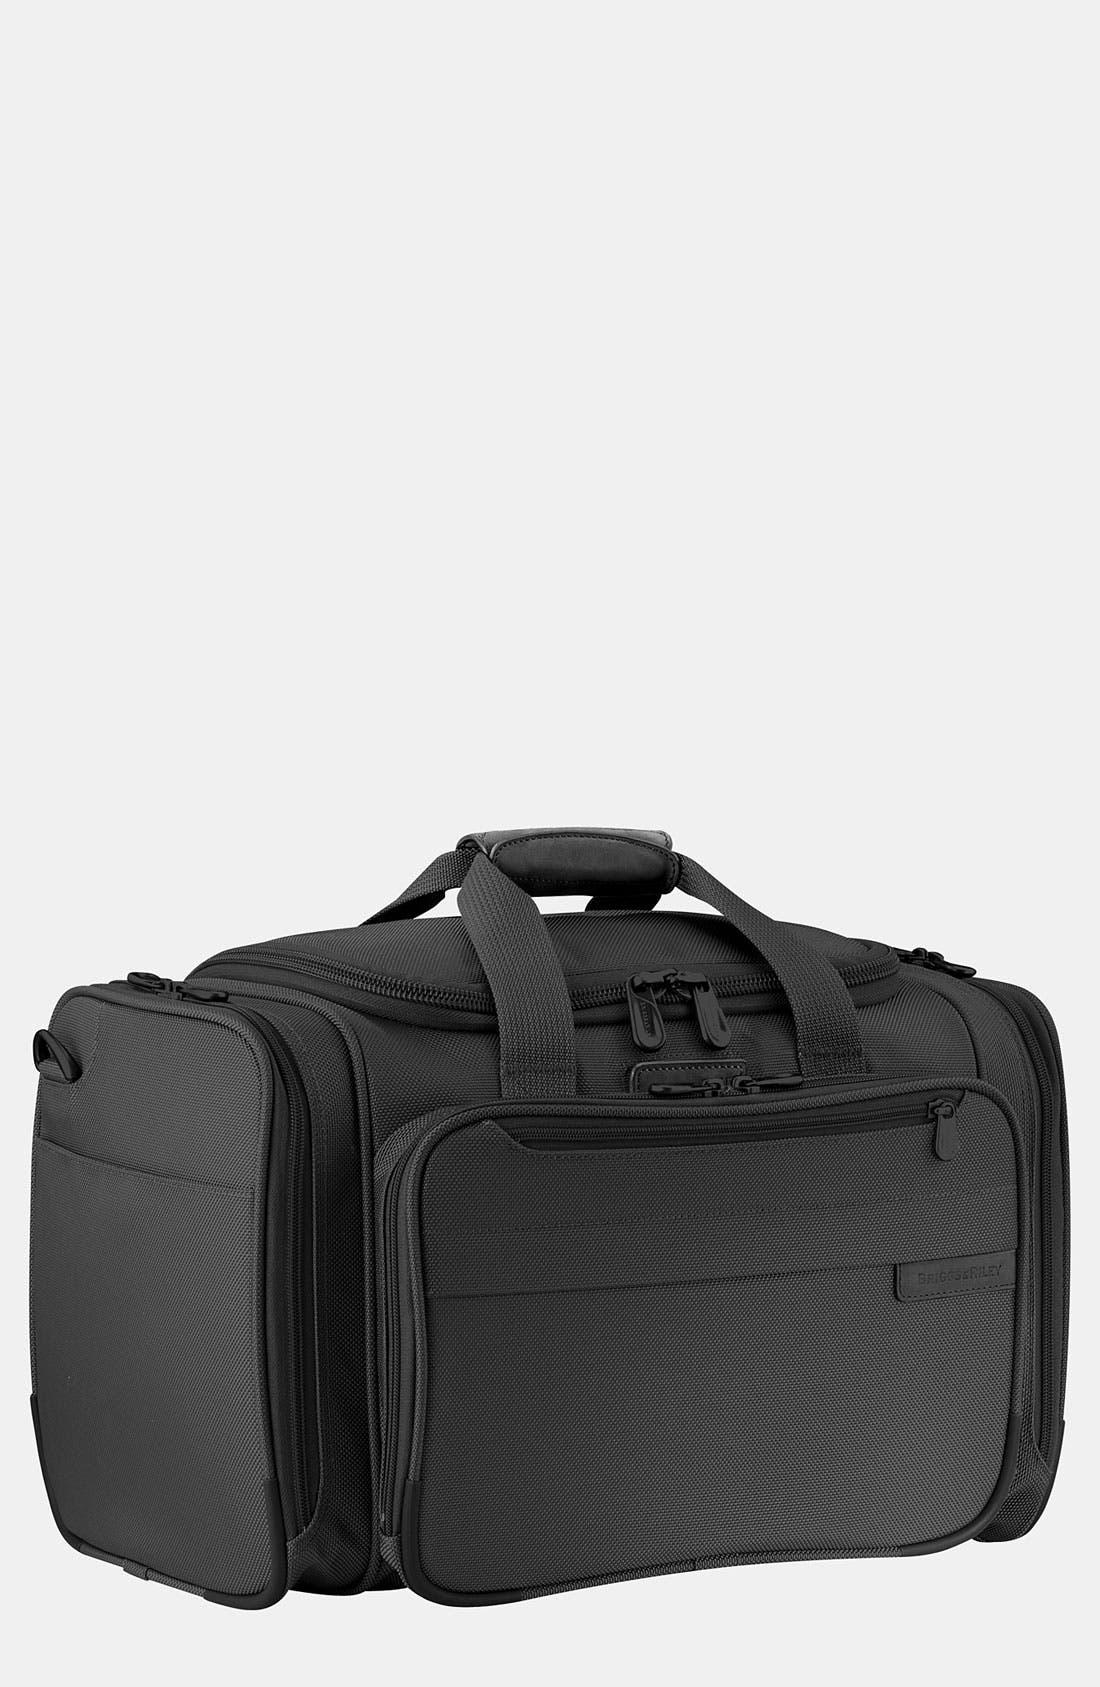 Main Image - Briggs & Riley 'Baseline - Deluxe' Duffel Bag